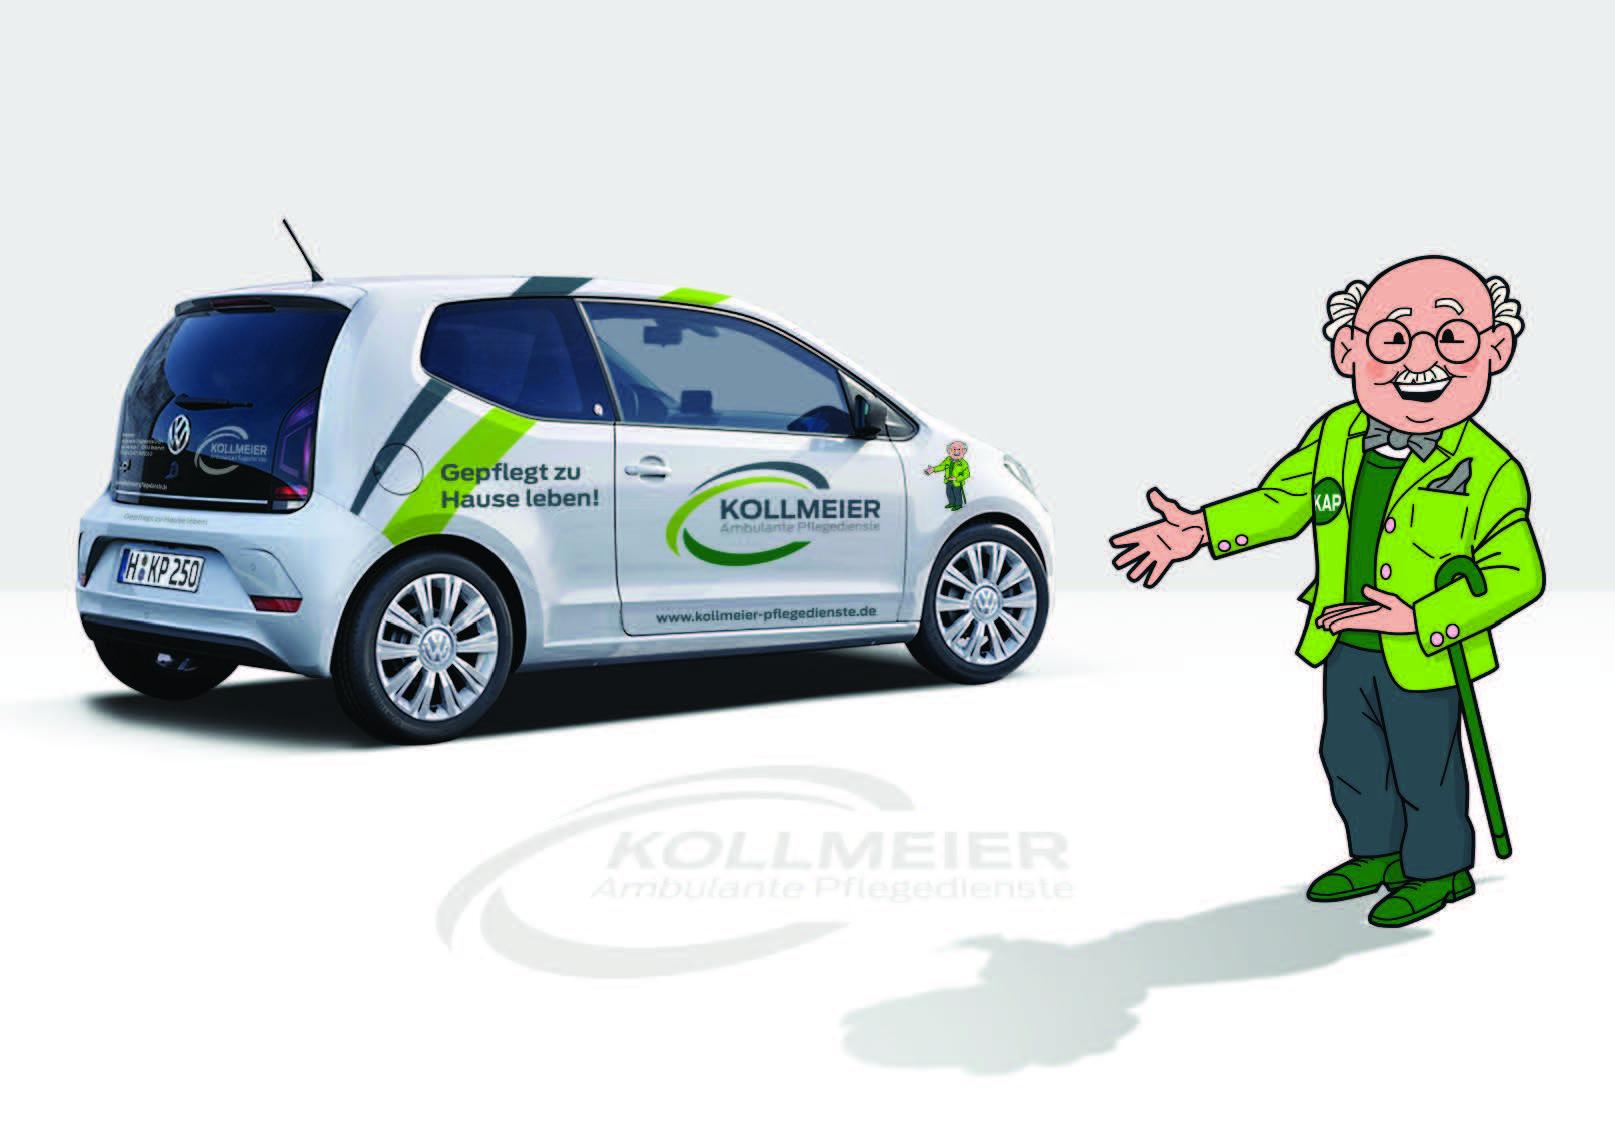 Jetzt auch ambulant - Kollmeier Ambulante Pflegedienste GmbH